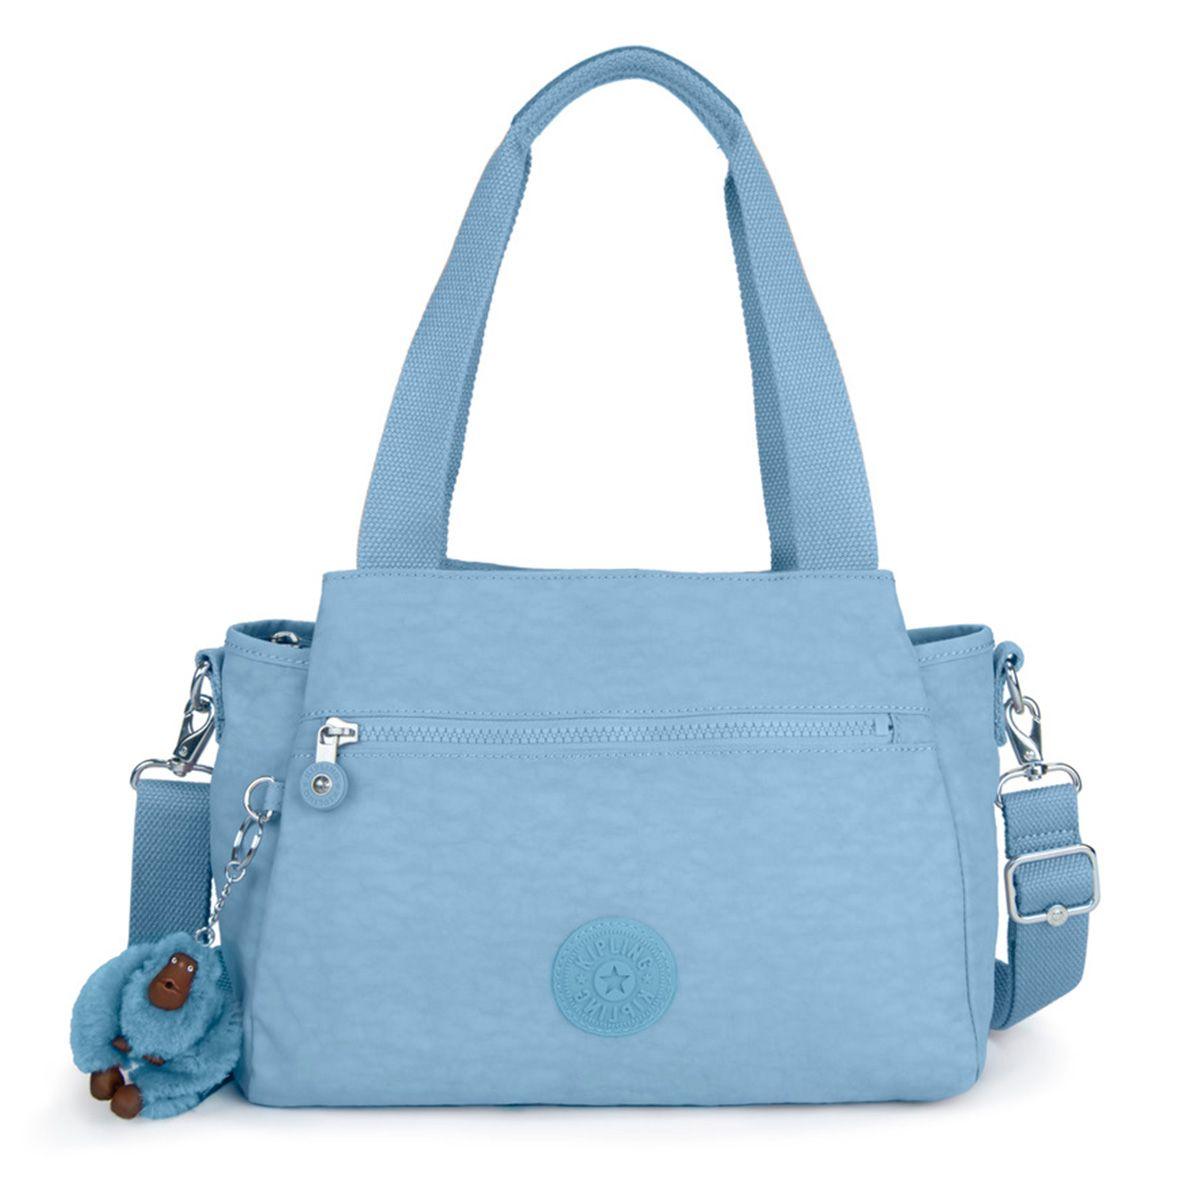 87ca11b7e9 Kipling Handbags